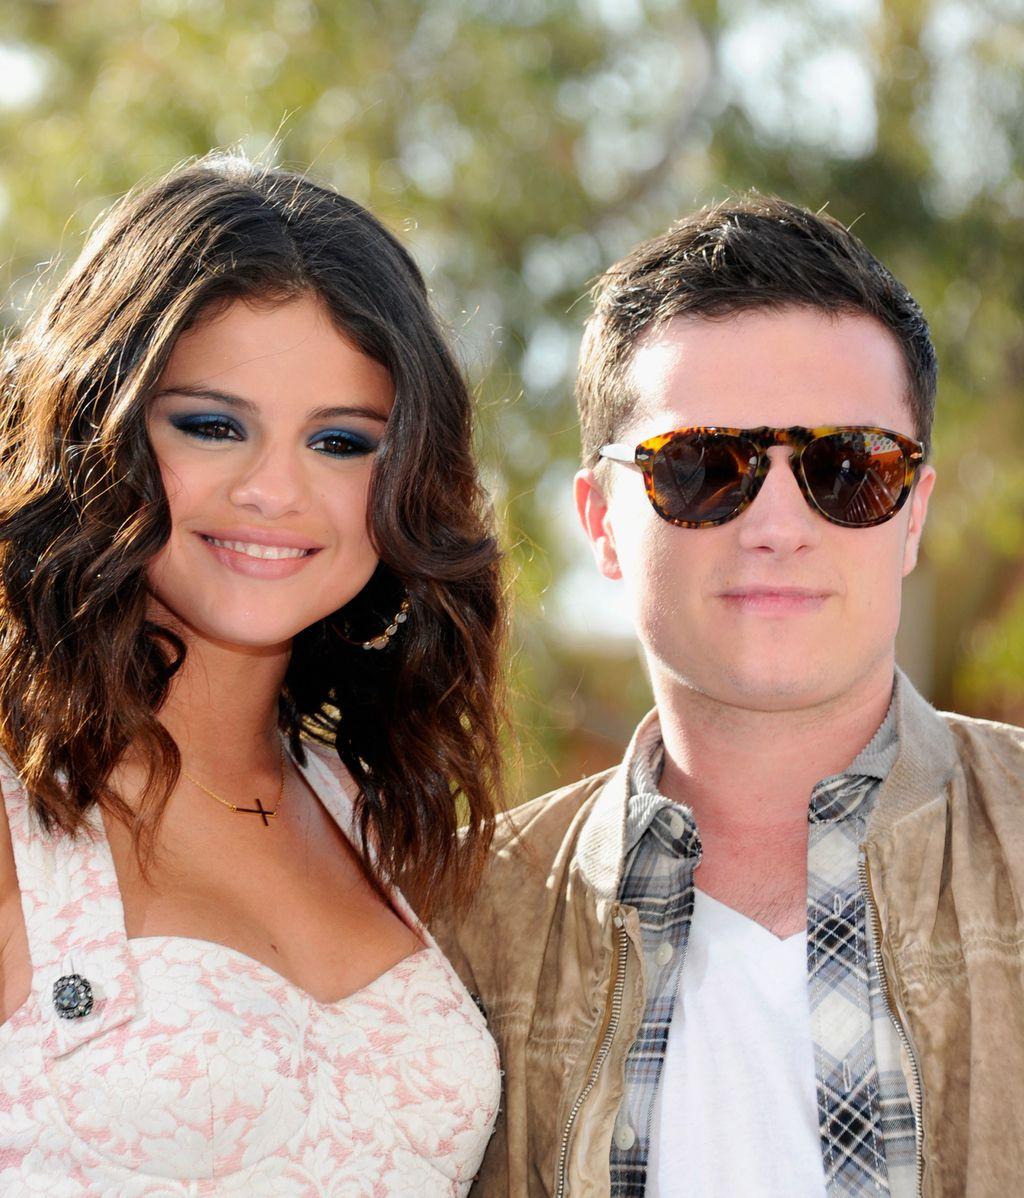 Katy Perry, Taylor Lautner, Big Time Rush, Selena Gomez, Kristen Stewart, LMFAO o Justin Bieber, los reyes del moco verde